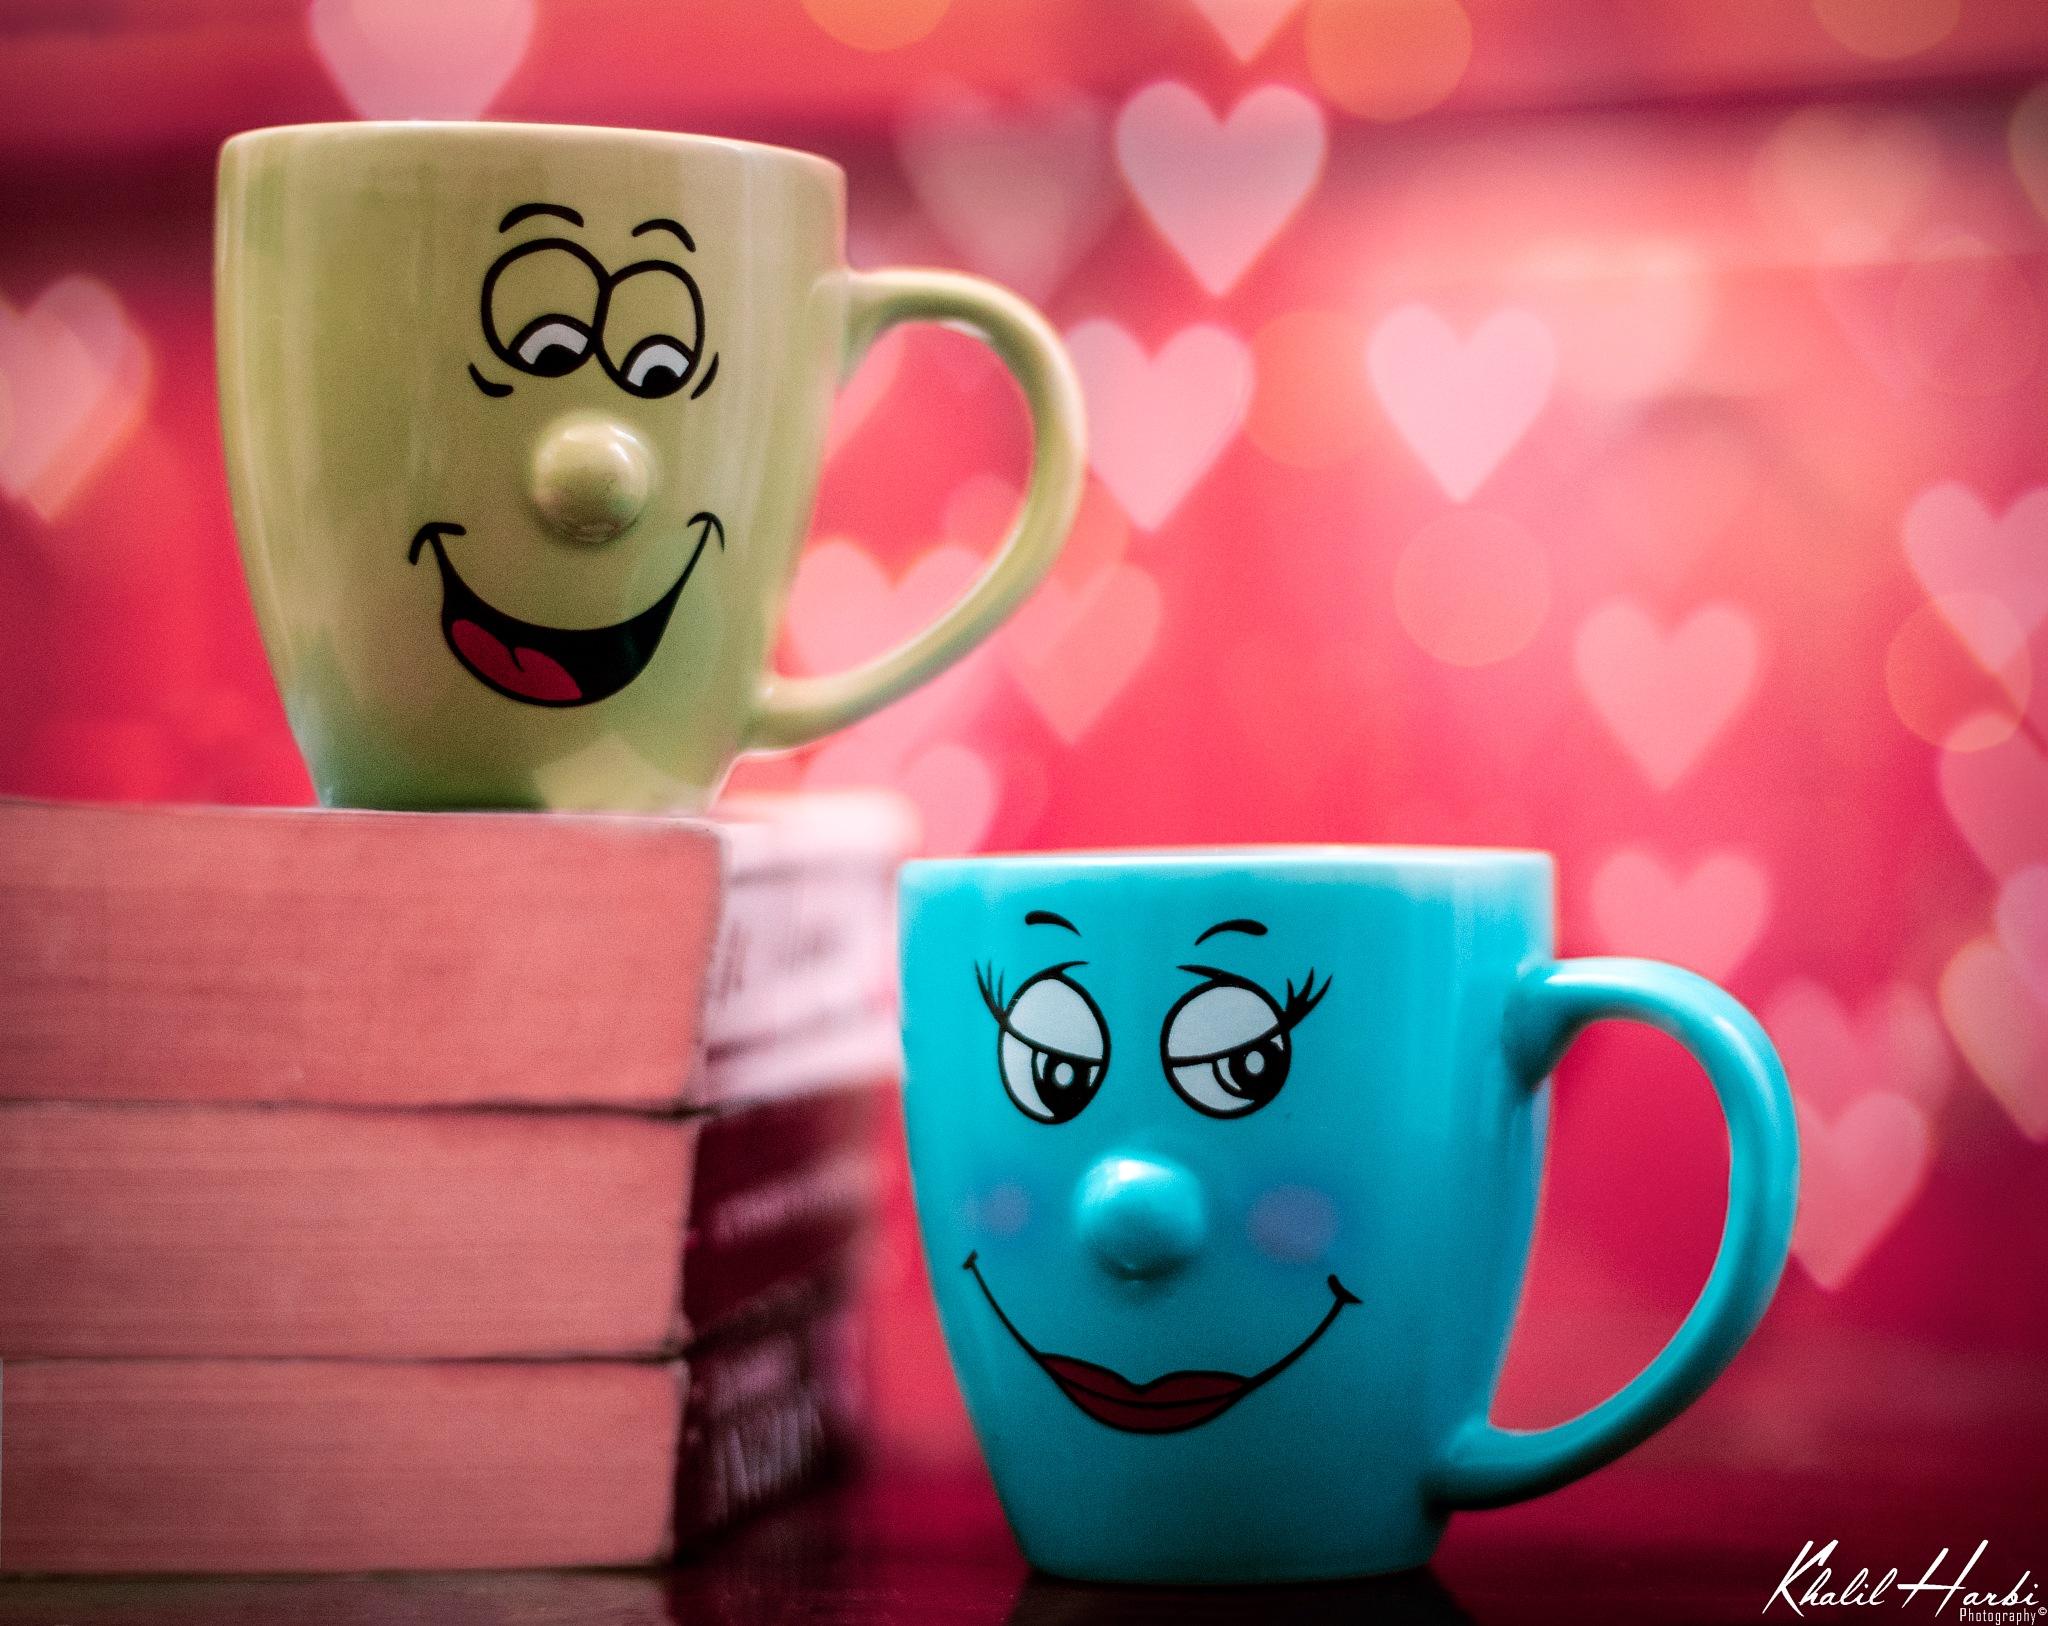 loving cups  by khalil harbi